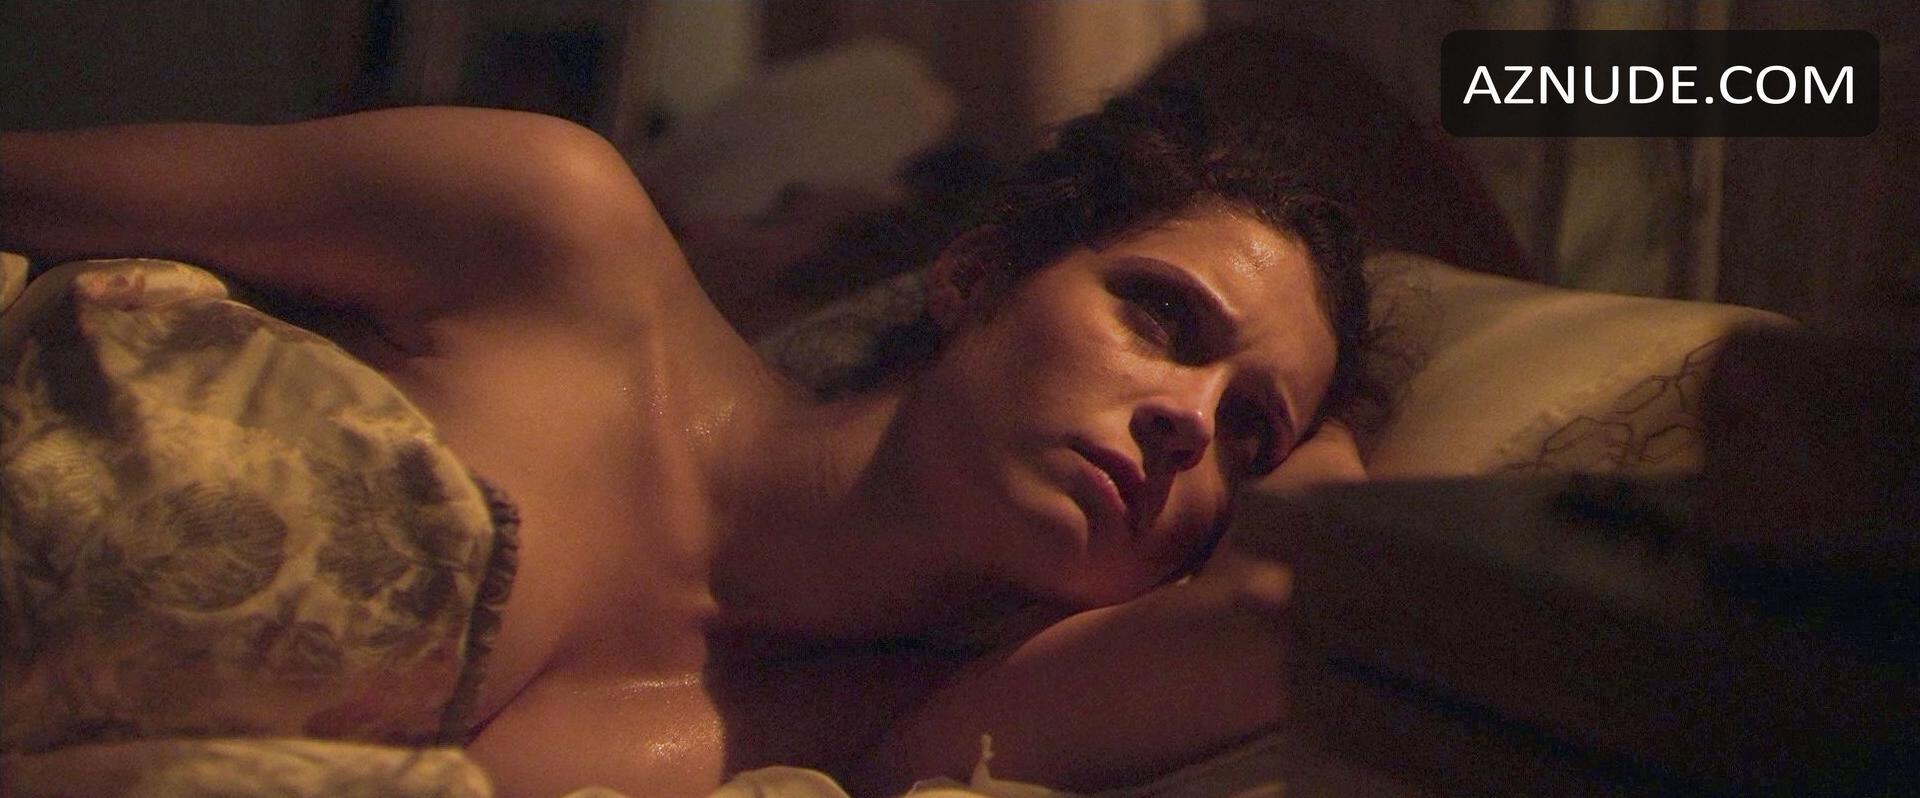 Impudence! think, Kd aubert nude scene share